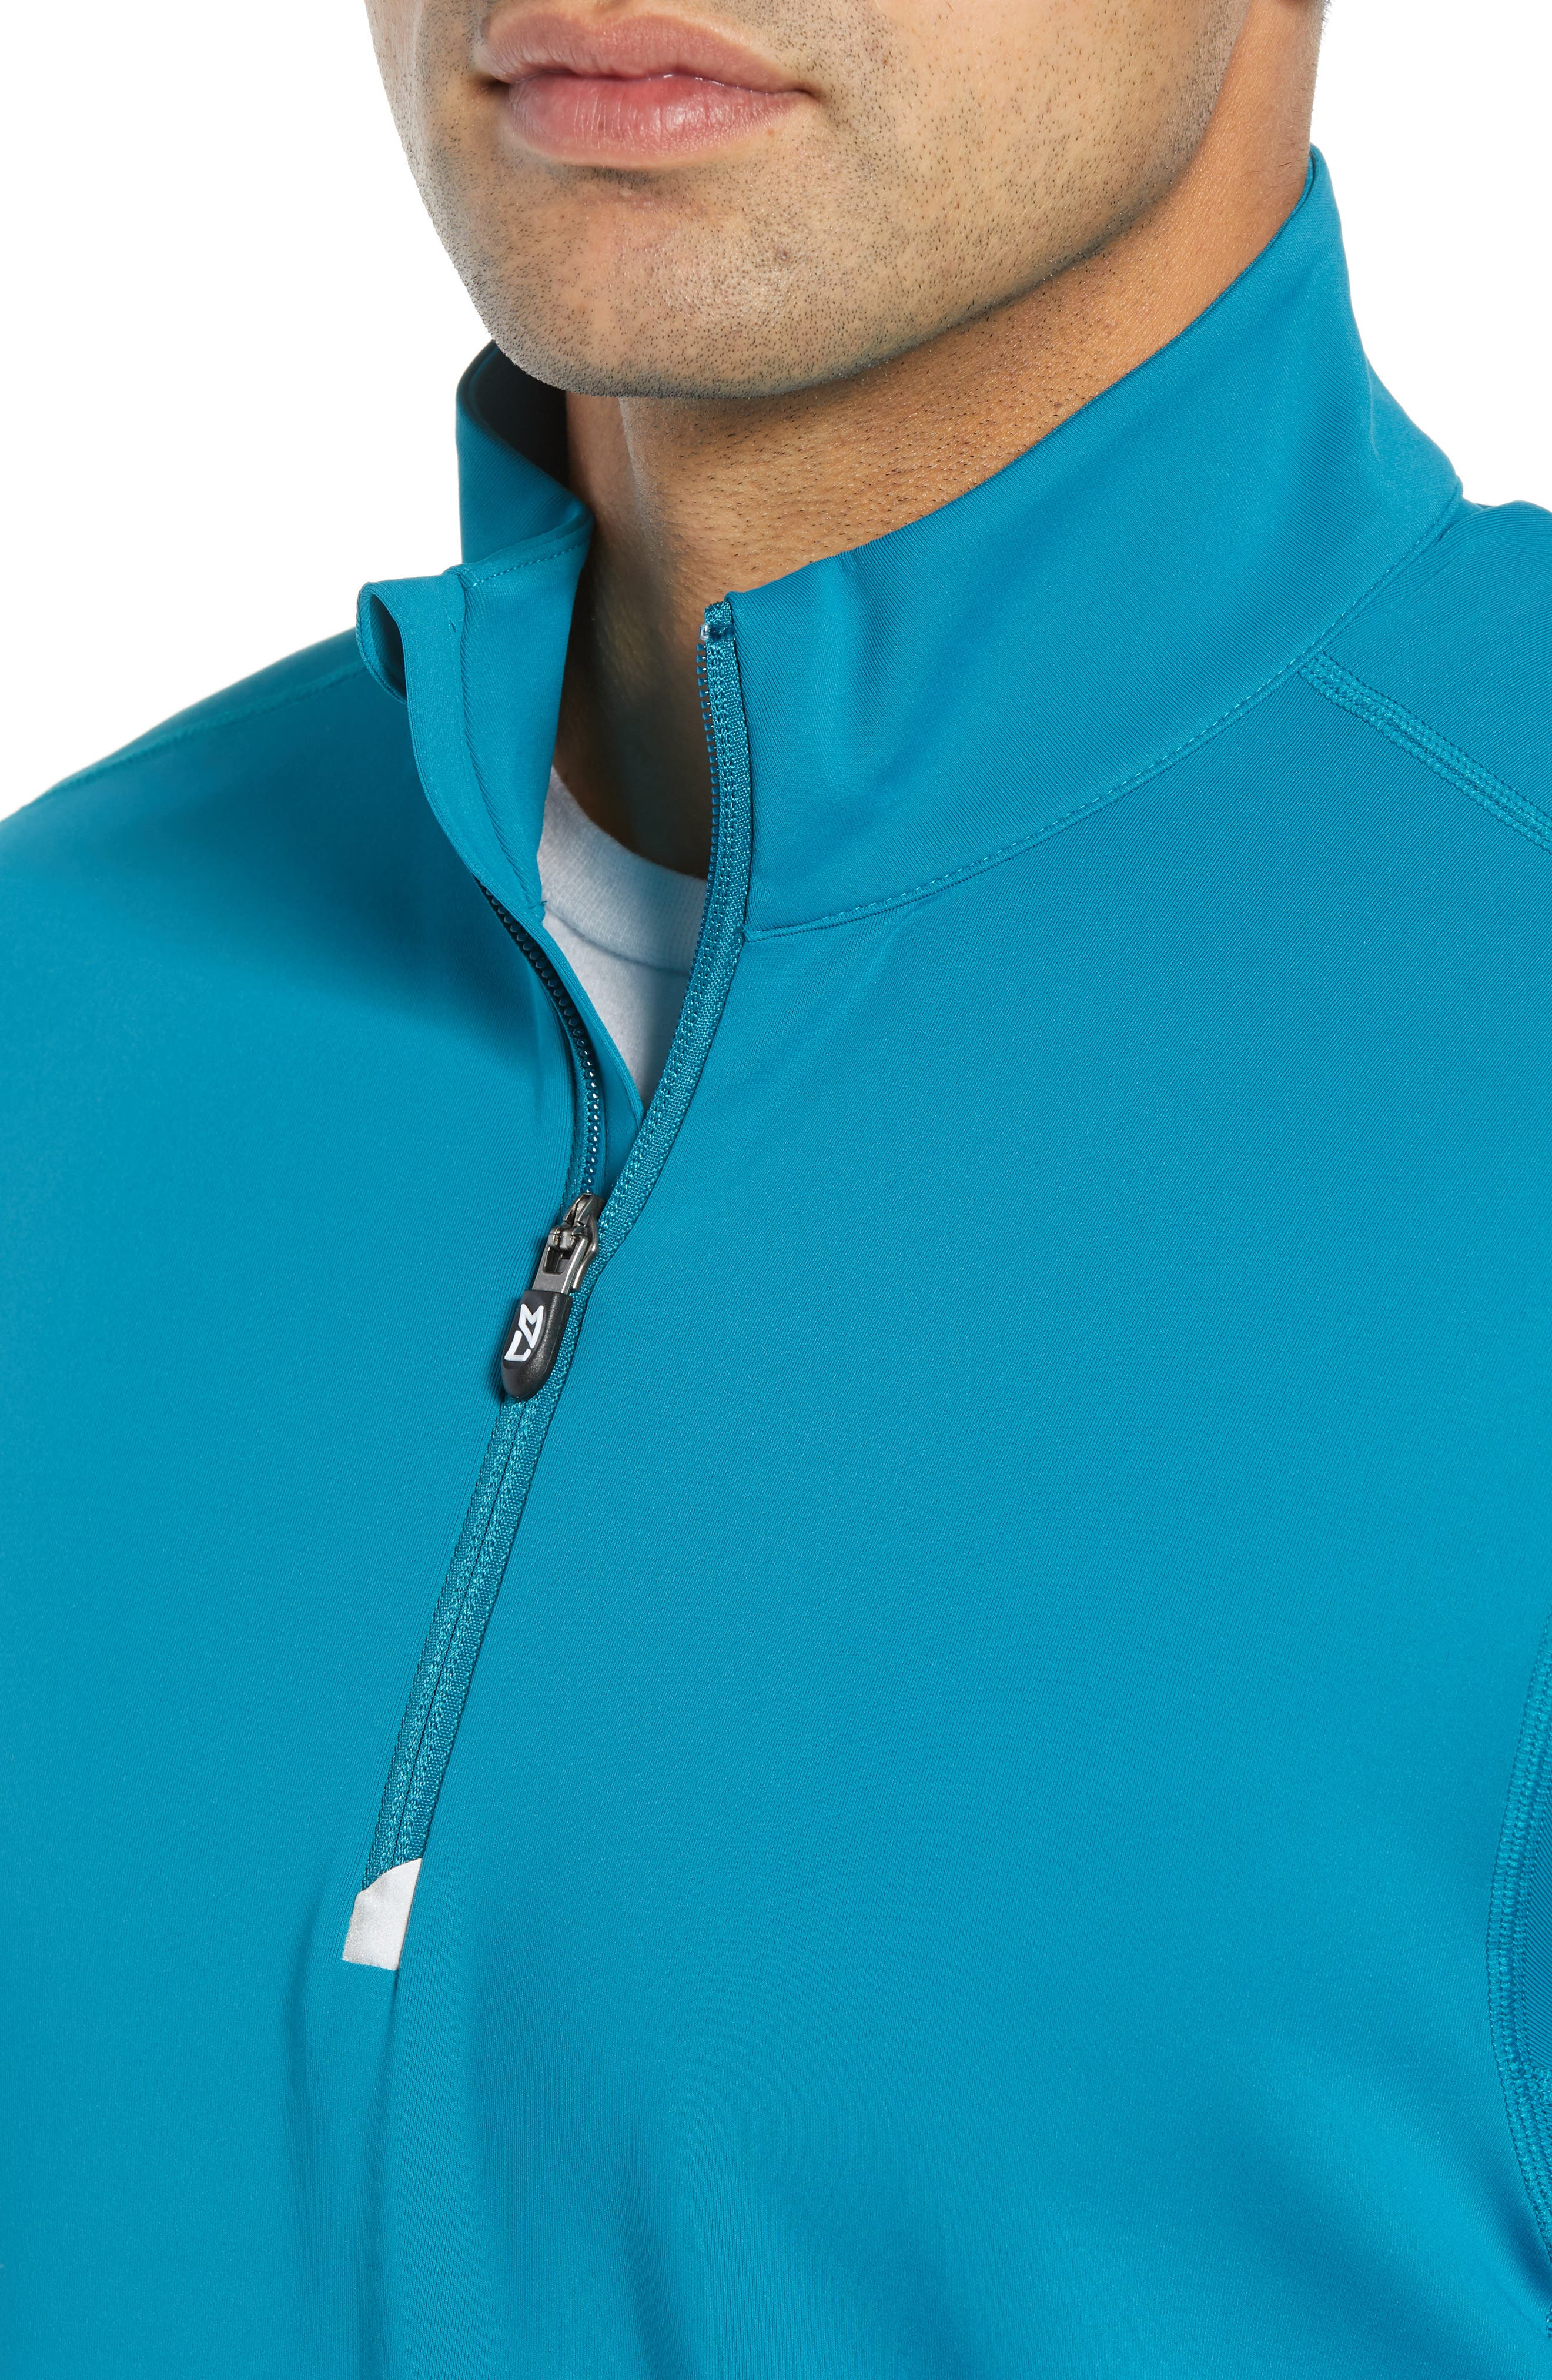 Traverse Regular Fit Quarter Zip Pullover,                             Alternate thumbnail 4, color,                             TEAL BLUE